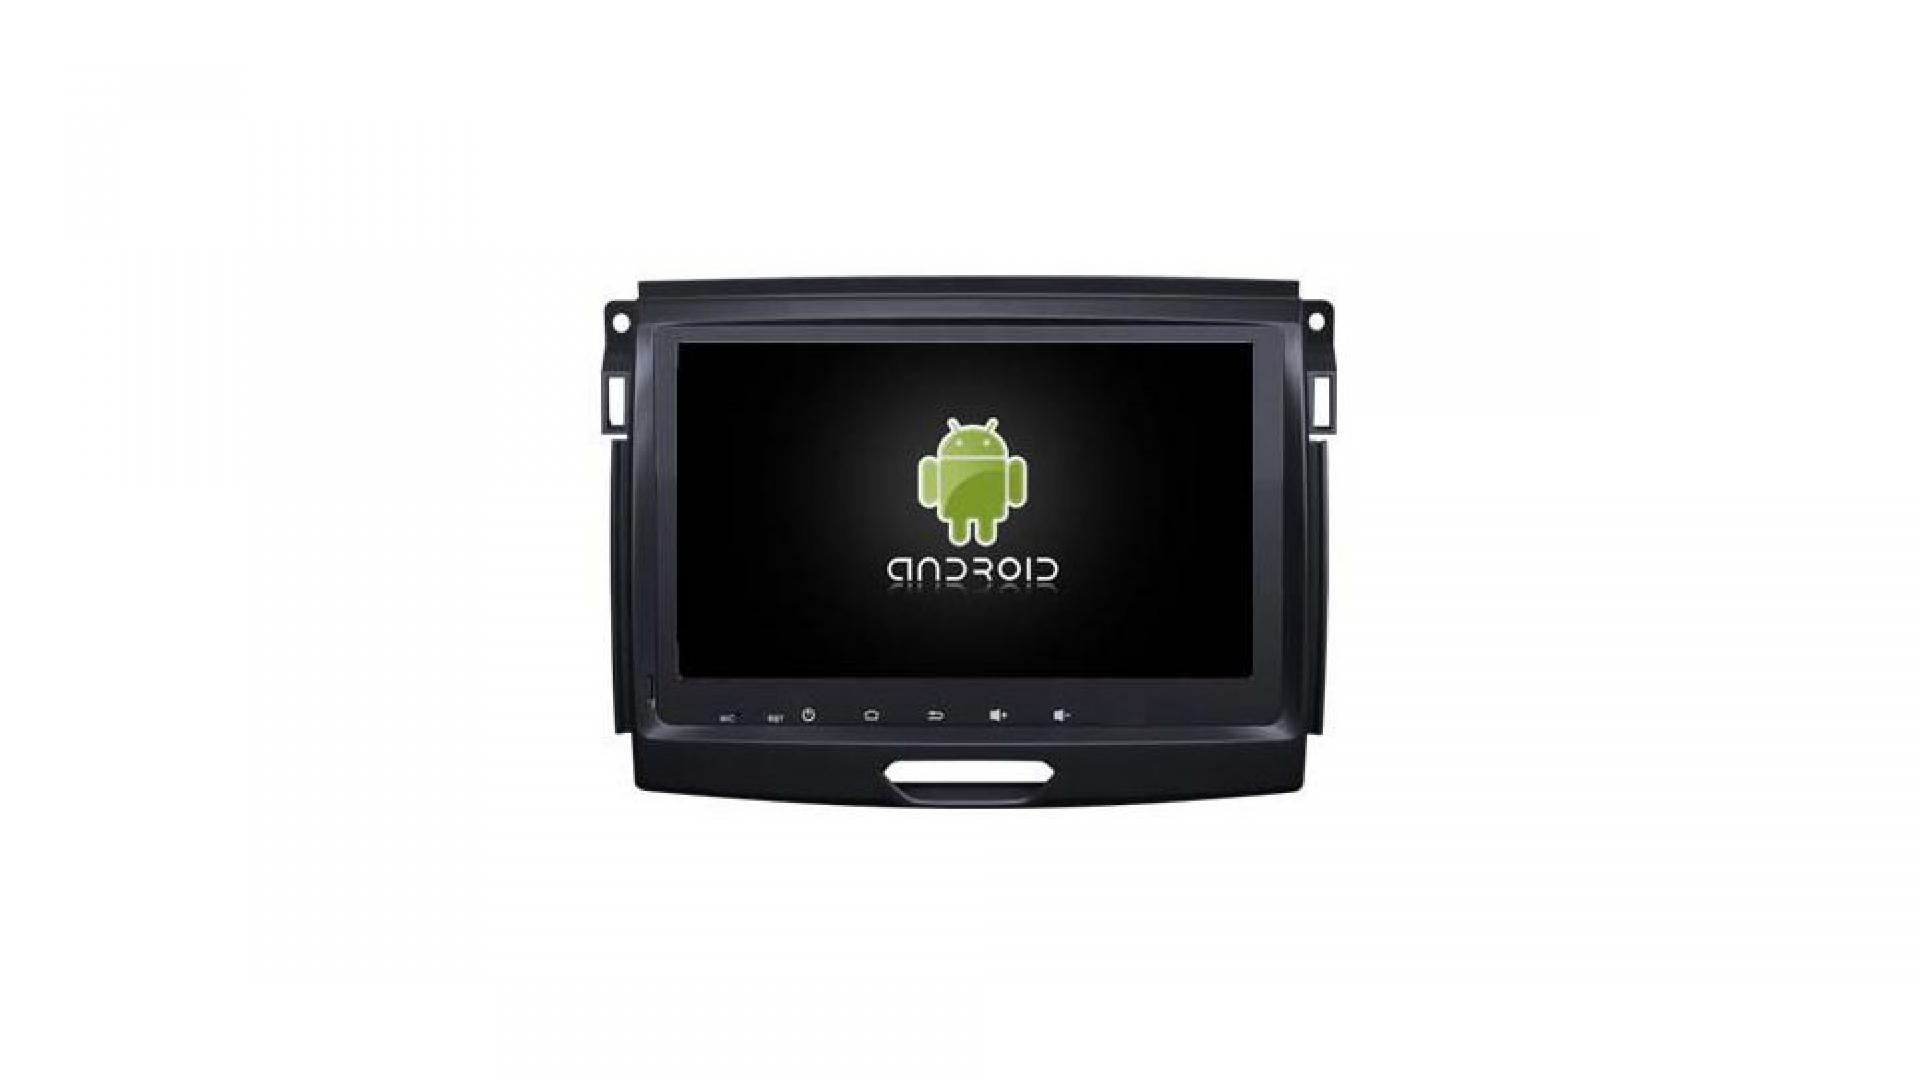 Autoradio gps bluetooth ford ranger android auto carplay camera de recul commande au volant 1